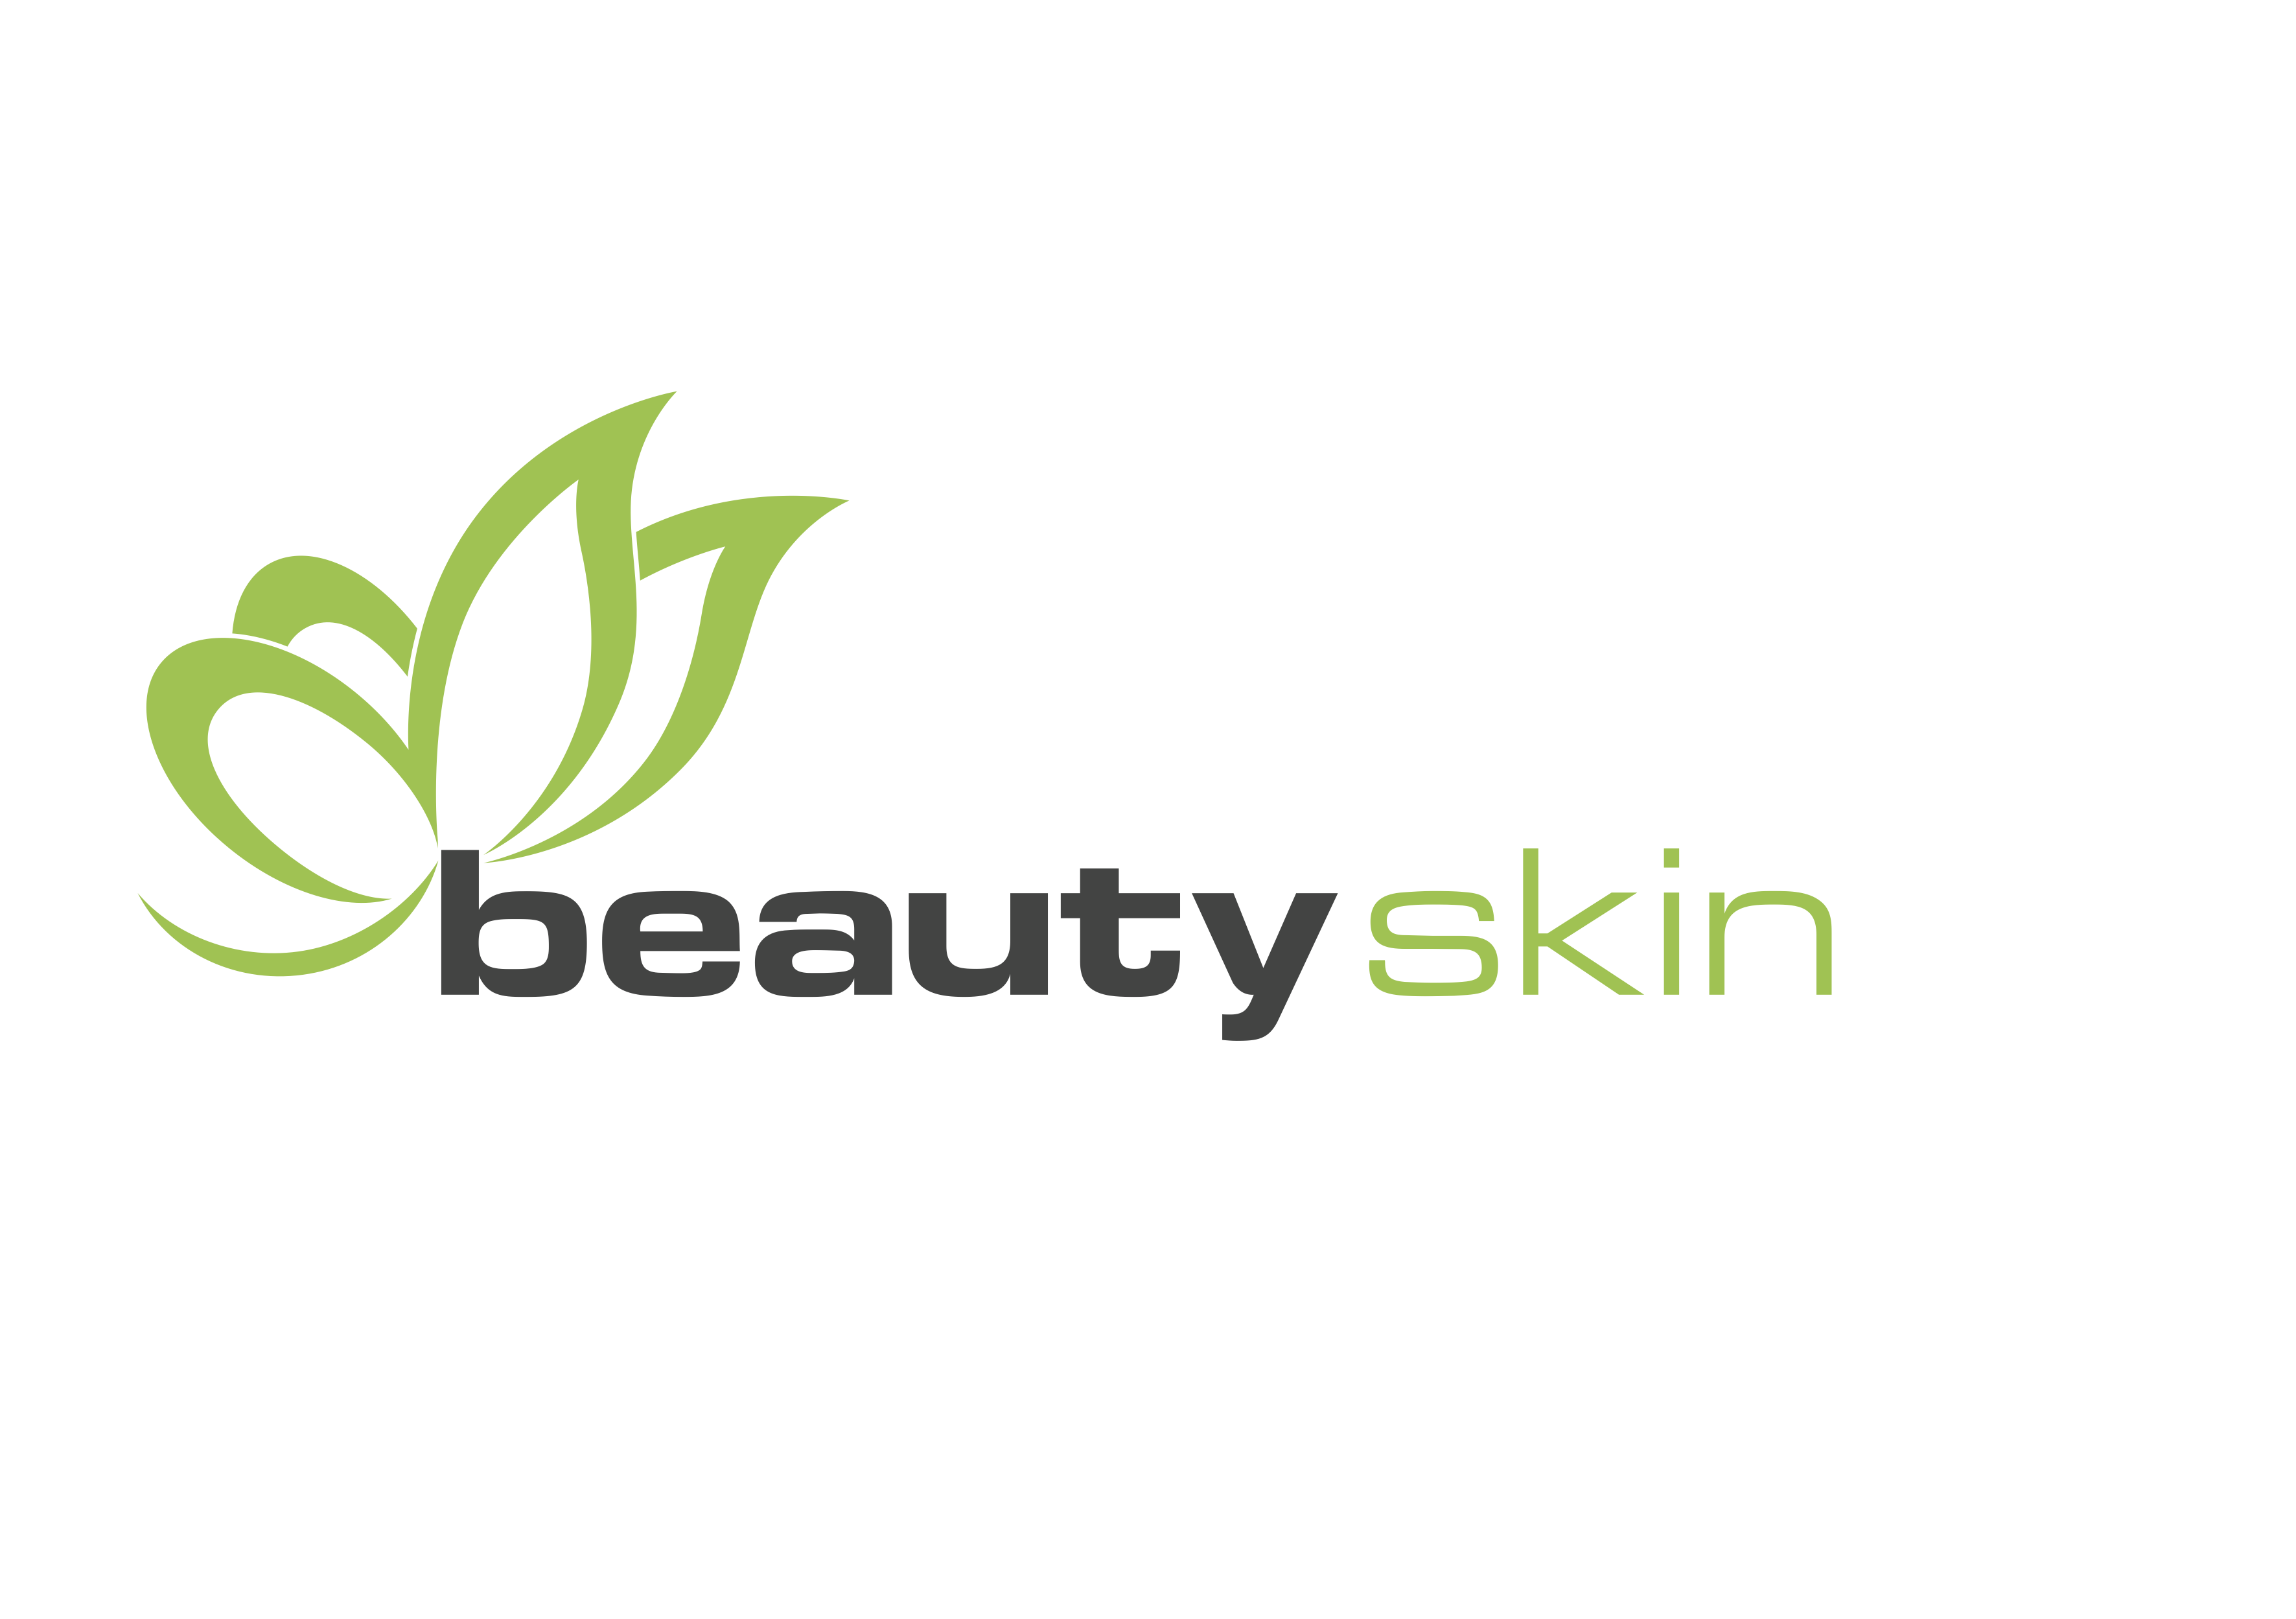 beauty skin - Studio für medizinische Ästhetik Logo